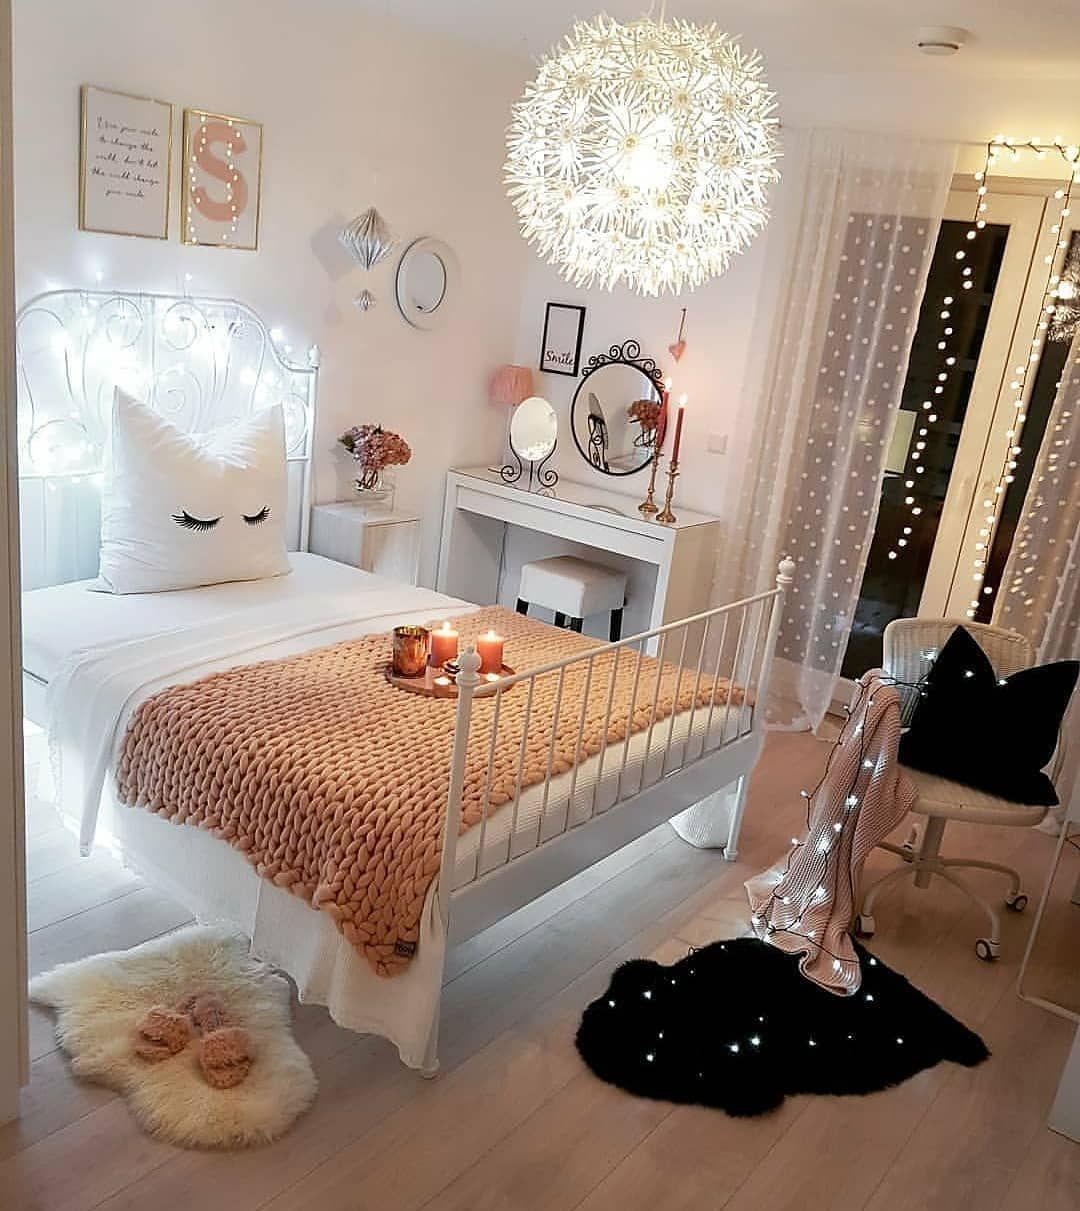 1 2 3 4 5 6 7 8 9 Or 10 Follow Inspiration Cutegirl Inspiration Cutegirl Inspiration Cutegirl In 2020 Bedroom Decor Bedroom Design Girl Bedroom Designs